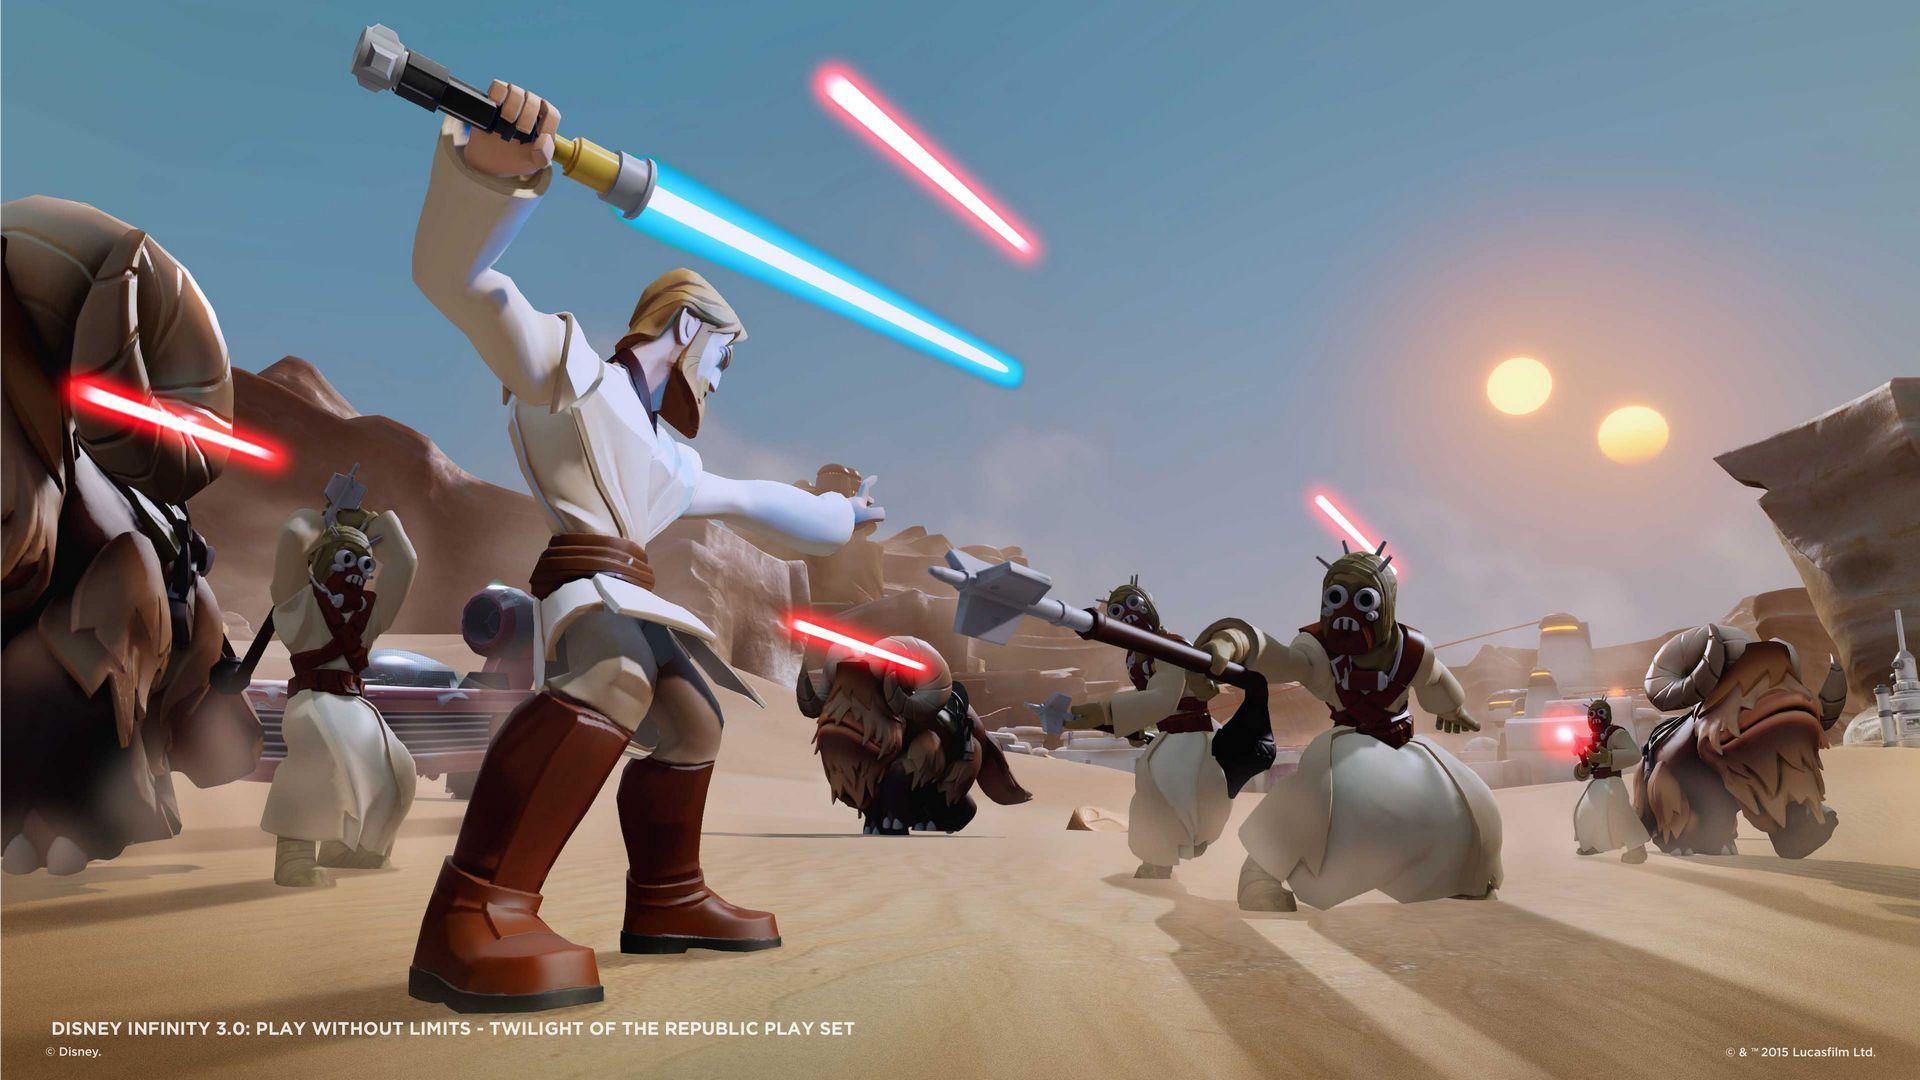 Disney Infinity 3.0 Star Wars Play Set  #starwars #videogame